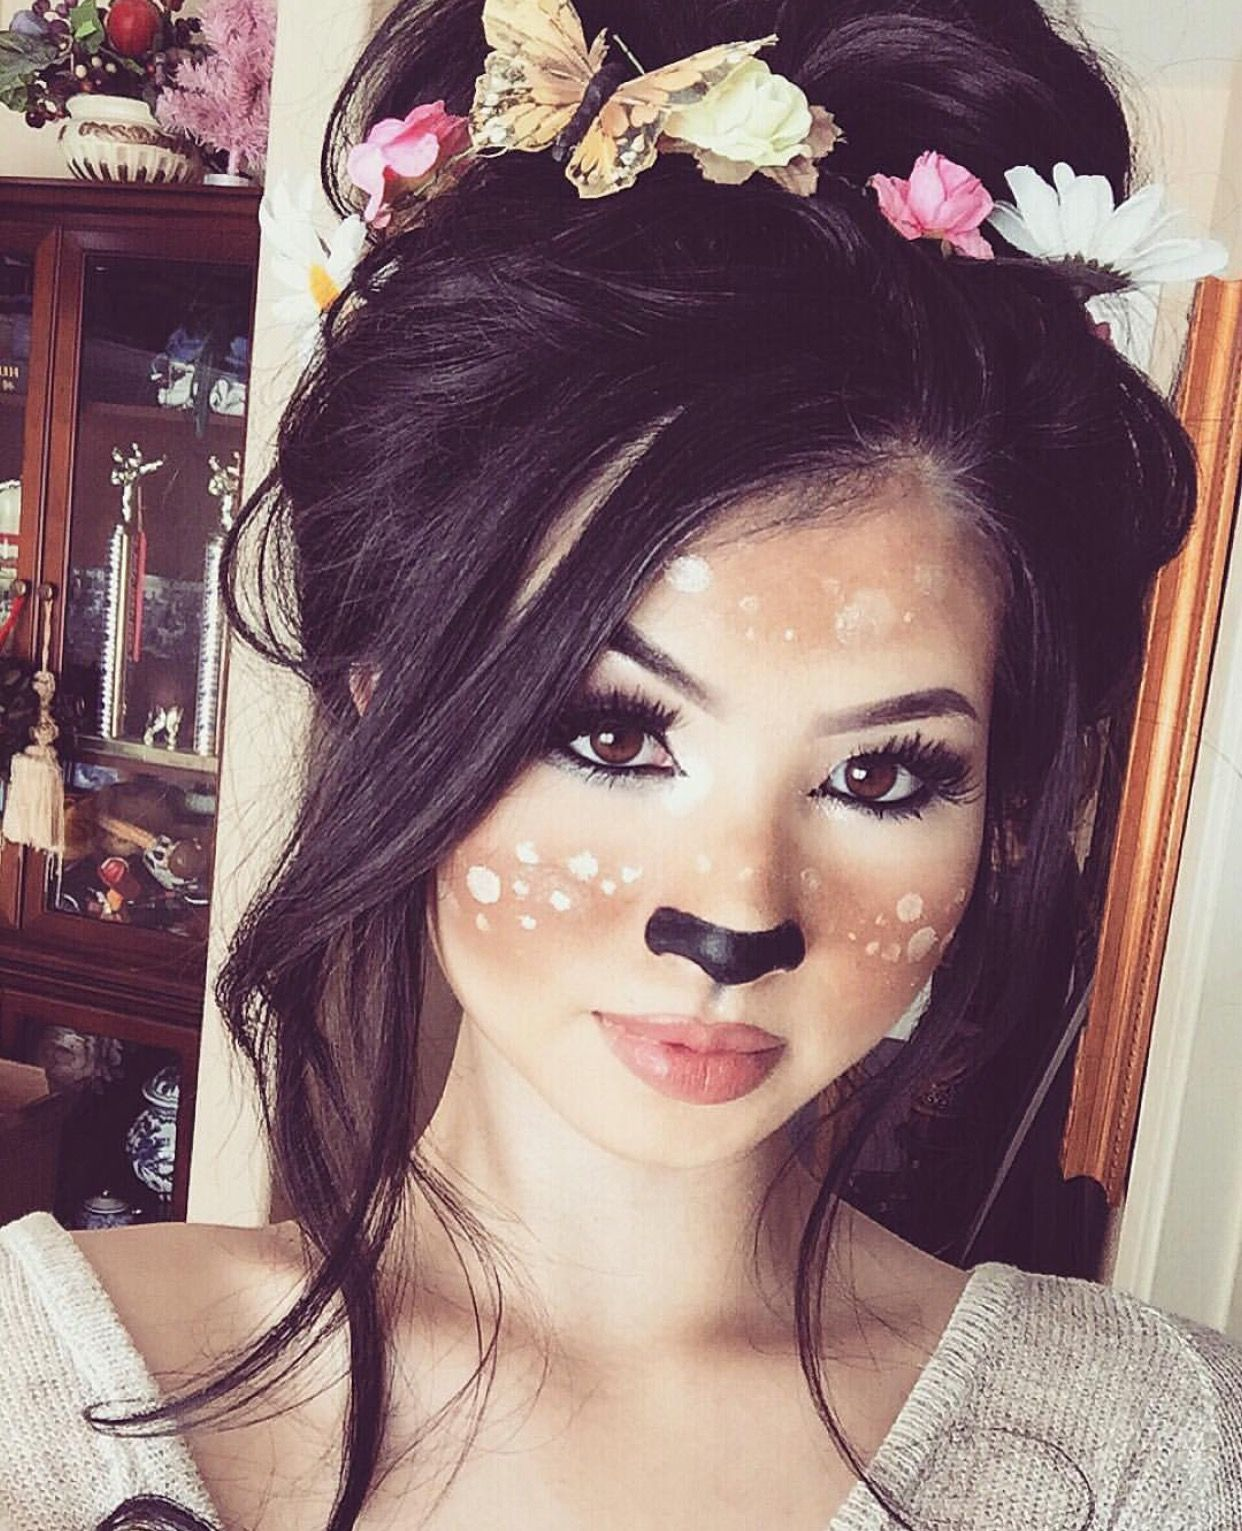 deer makeup for halloween wwwinstagramcomkimberlyx3you